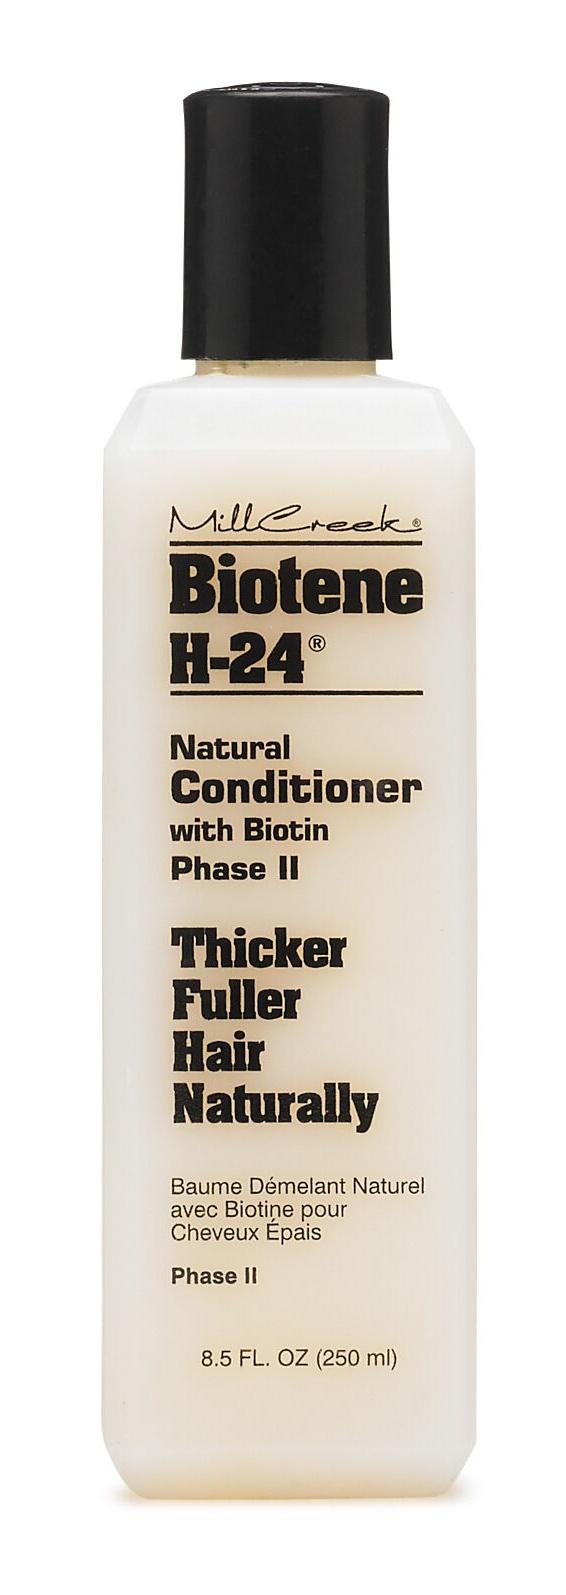 Mill Creek Botanicals Biotene H-24 Conditioner With Biotin Phase